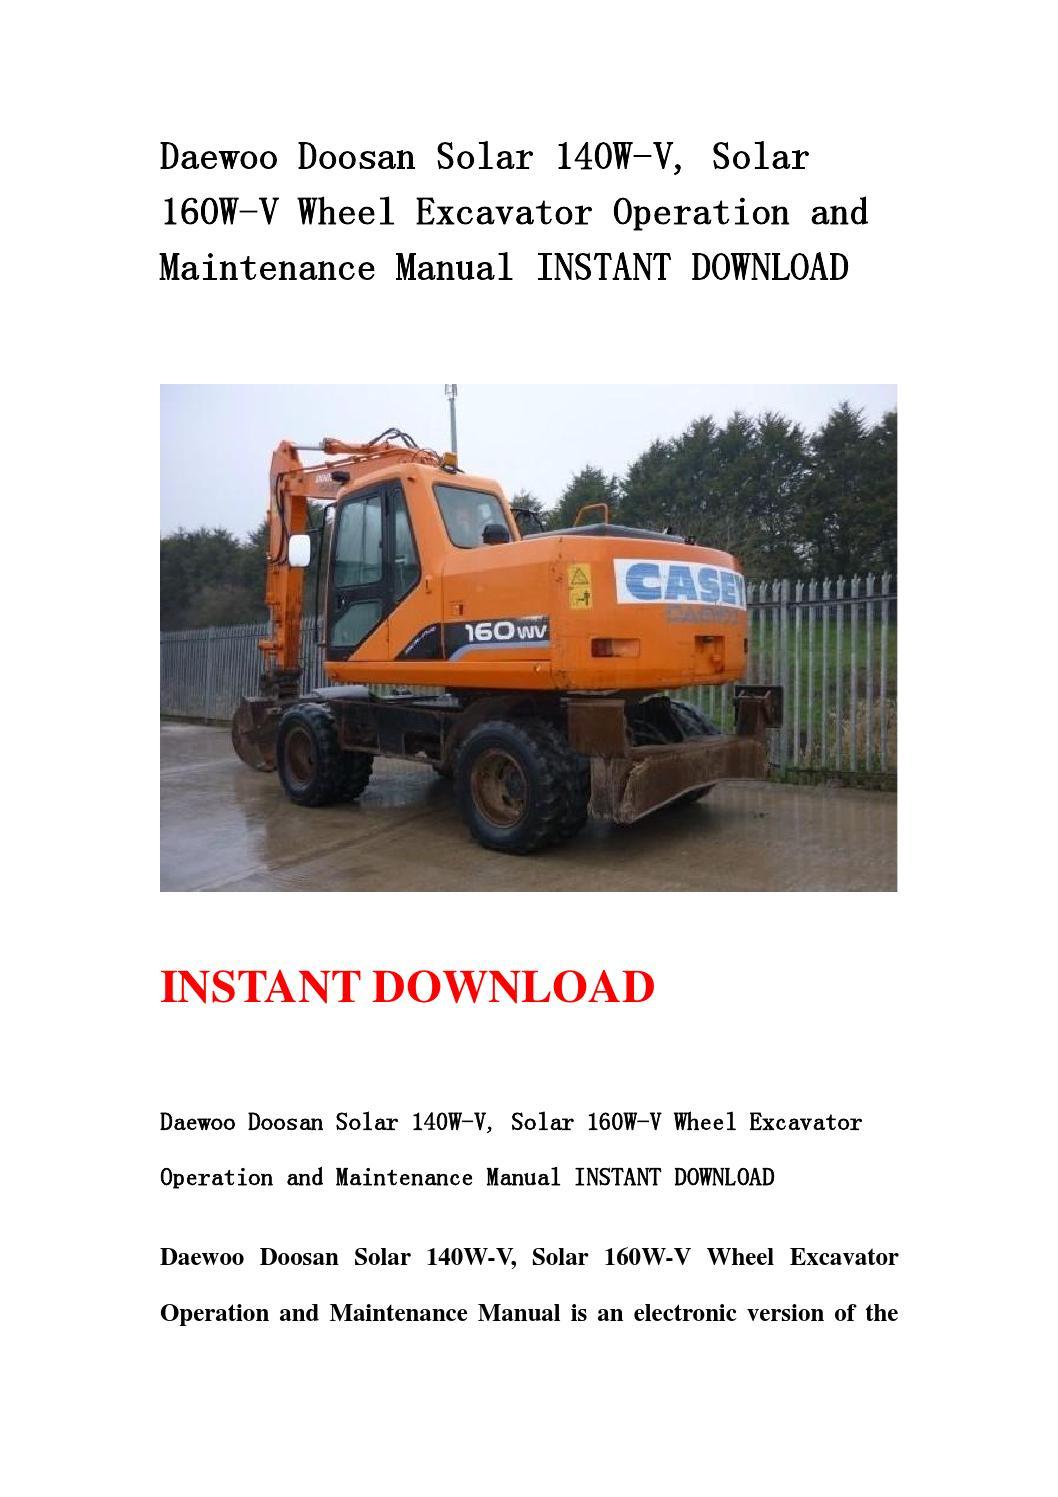 Daewoo doosan solar 140w v, solar 160w v wheel excavator operation and maintenance  manual instant do by jfnhsemmnf - issuu